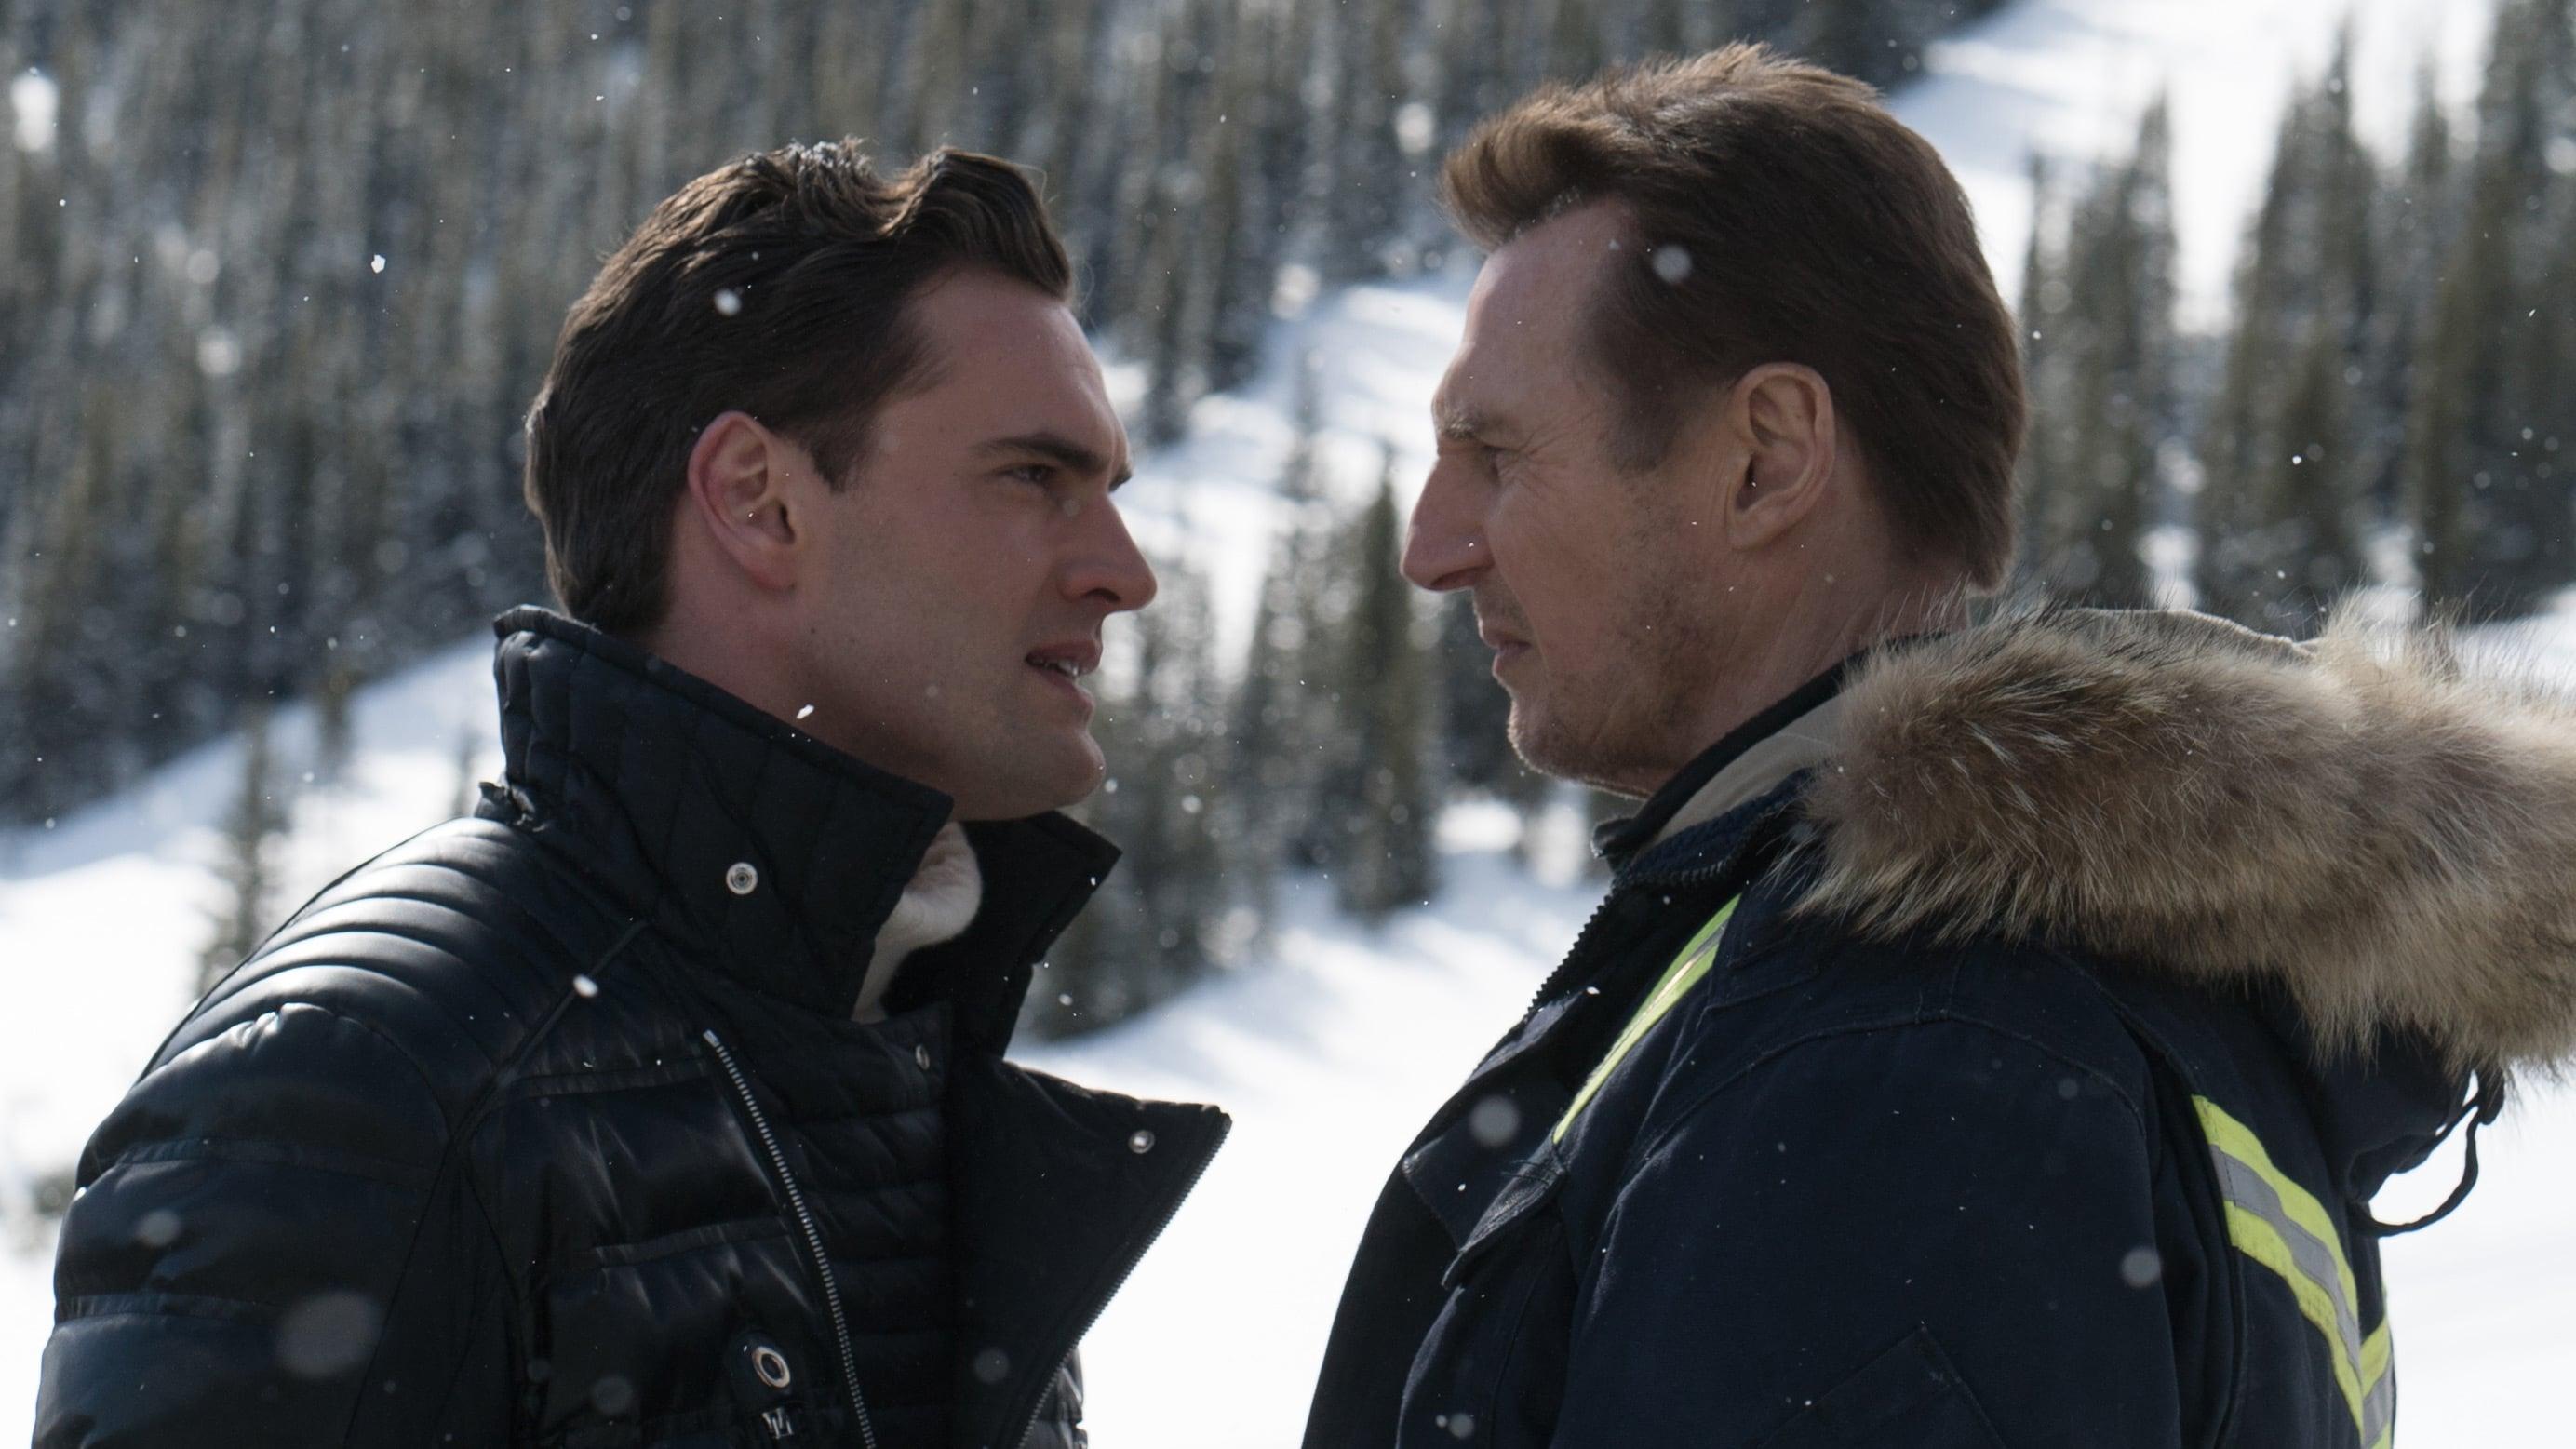 Tom Bateman as Viking against Liam Neeson as Nelson Coxman in Cold Pursuit (2019)